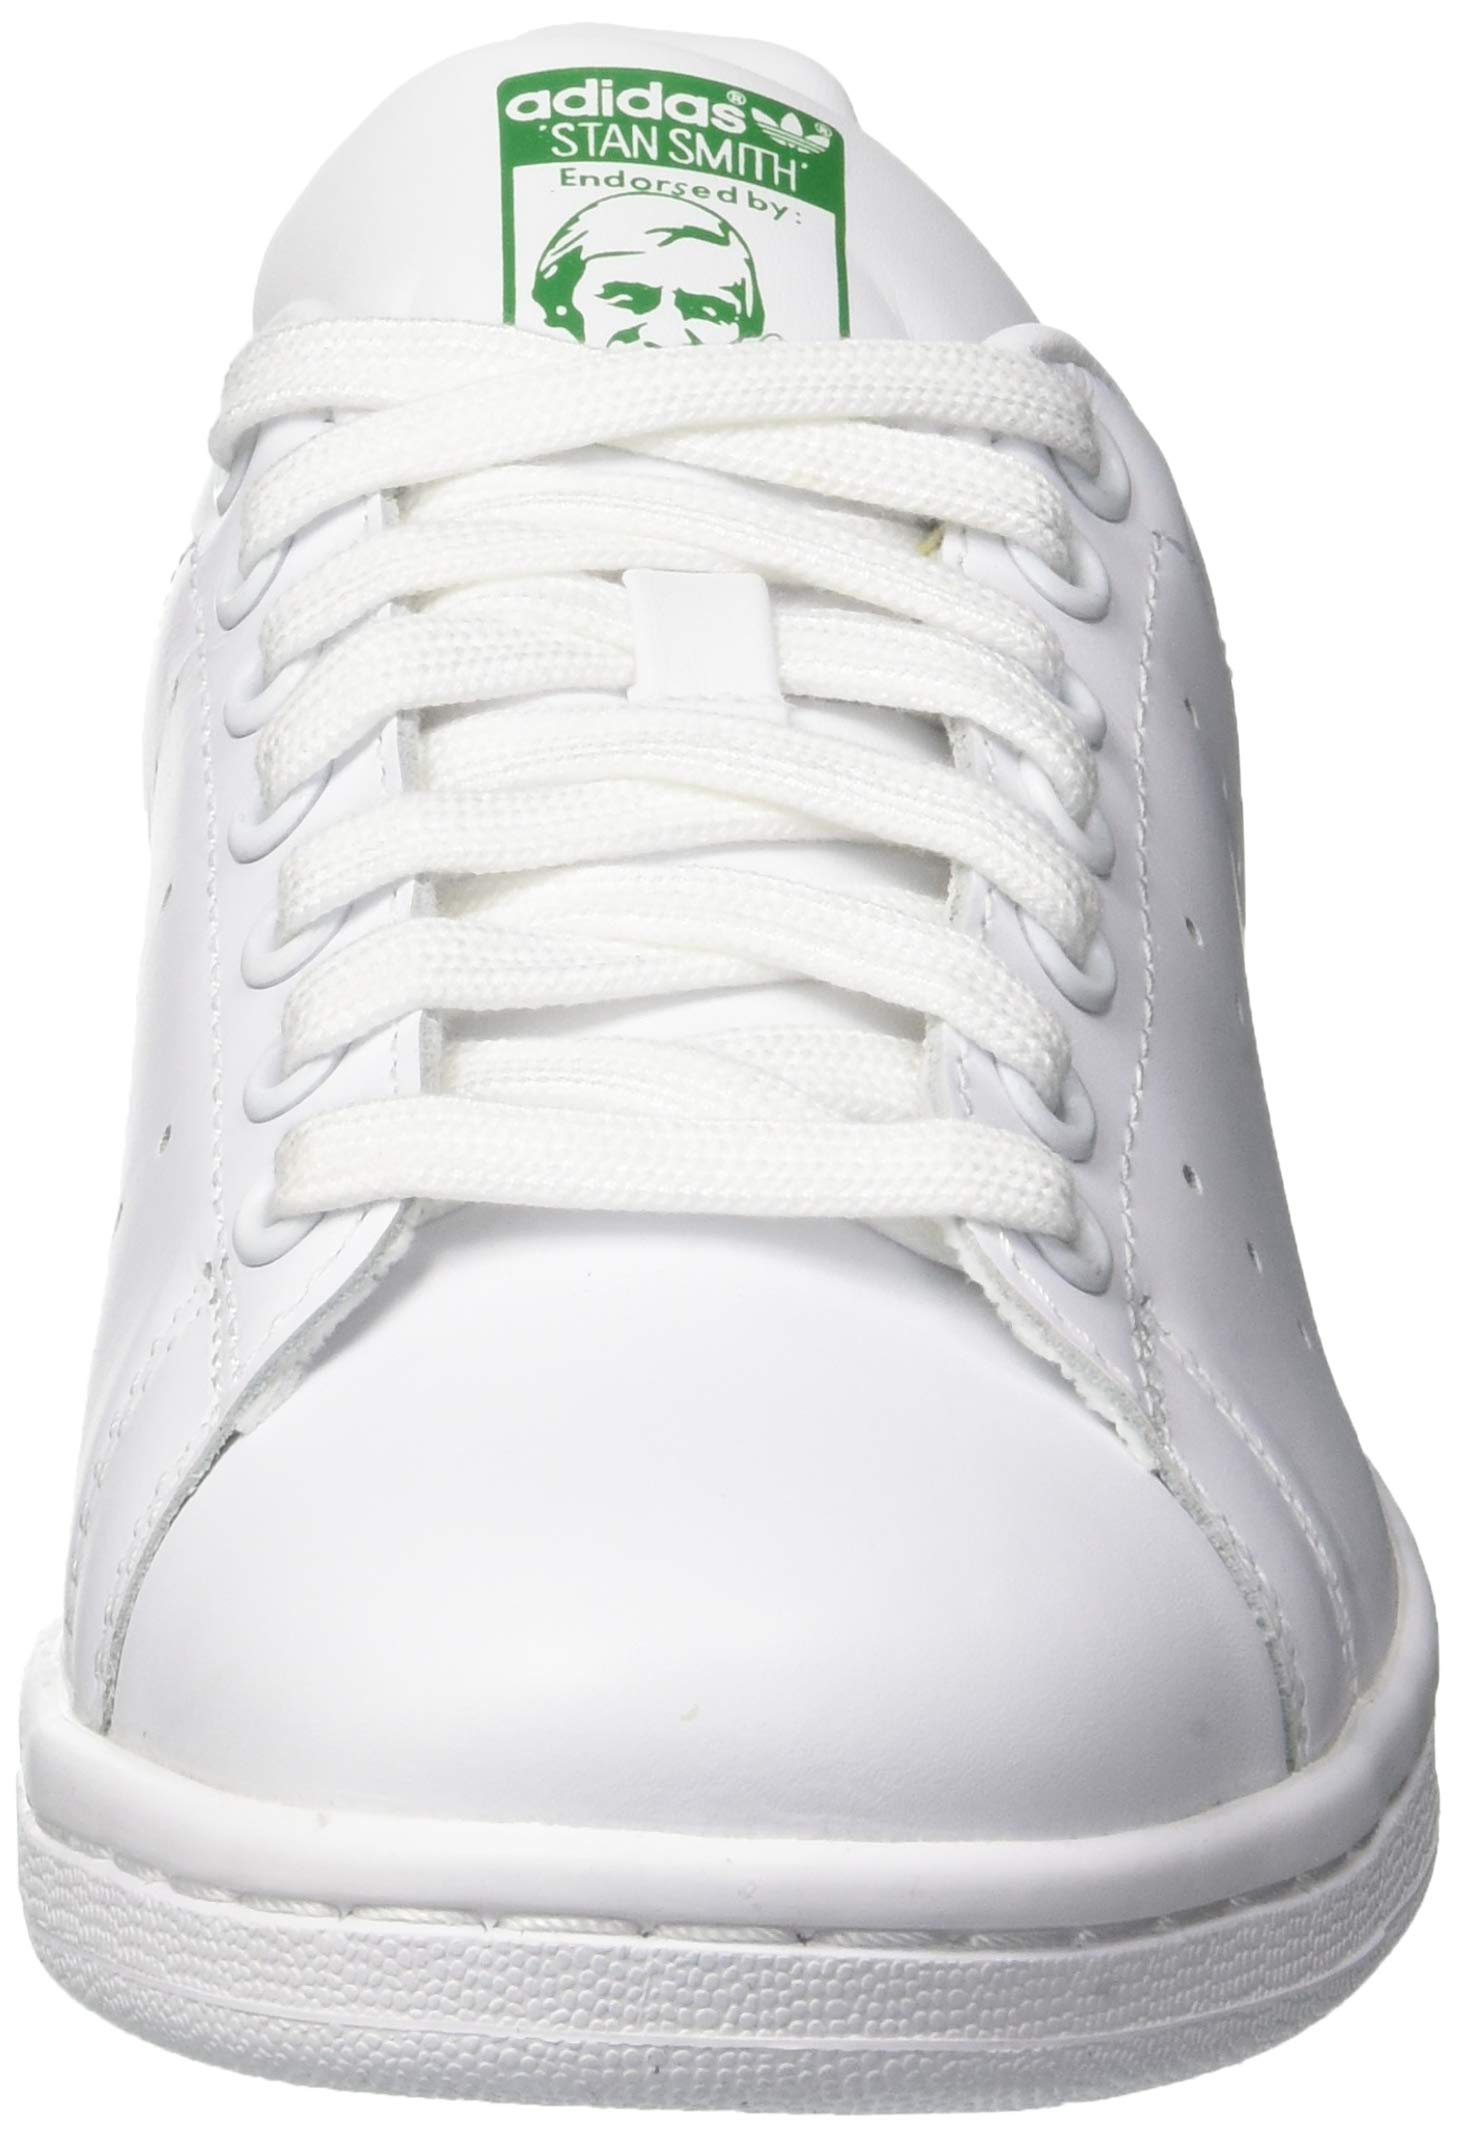 adidas Originals Stan Smith, Sneakers Unisex – Adulto 4 spesavip